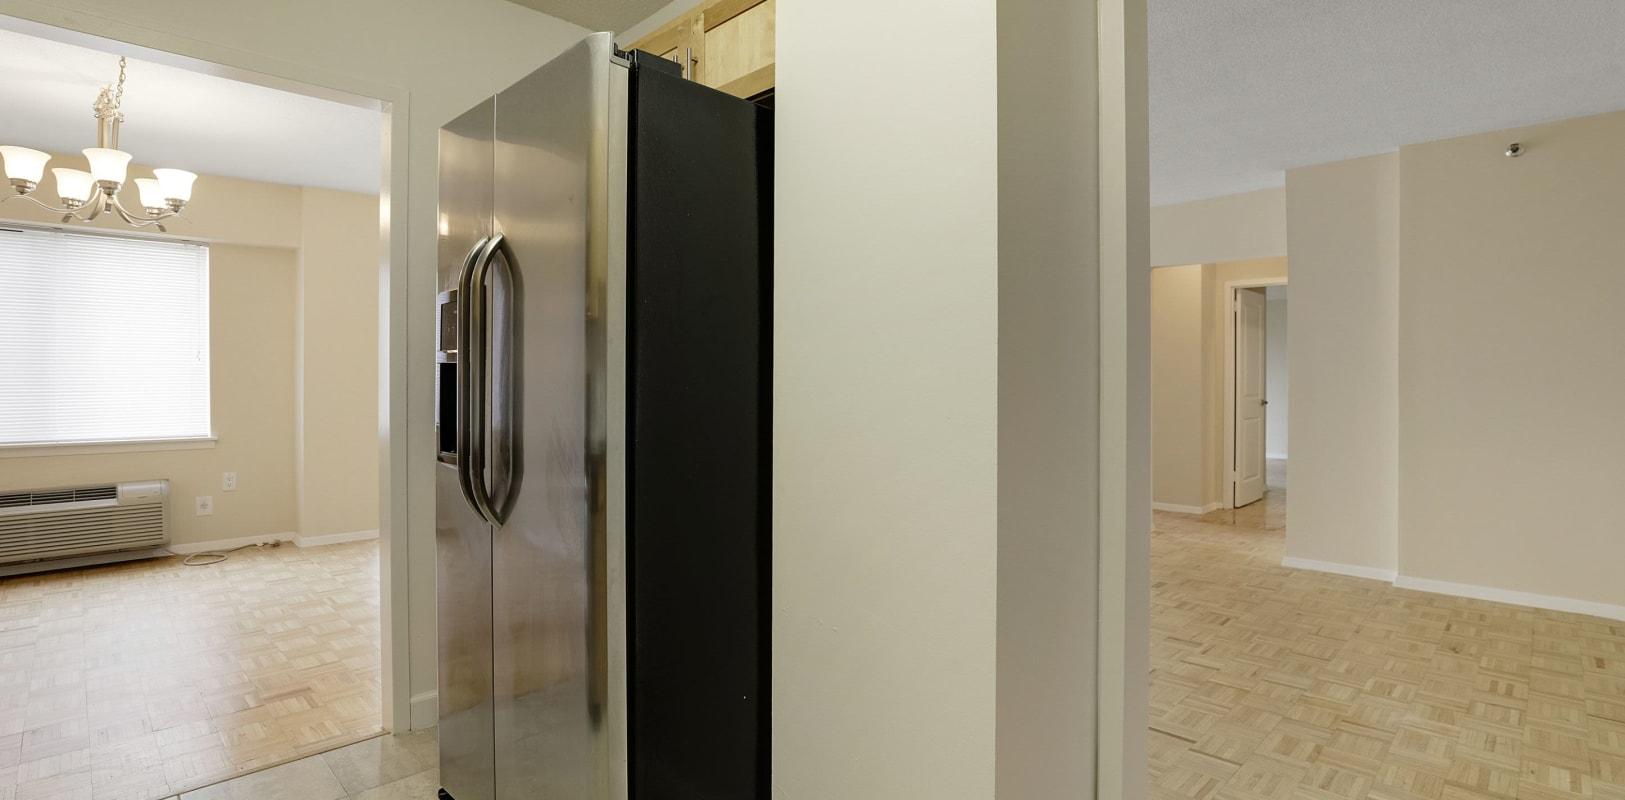 Open concept floor plans at 140 Prospect in Hackensack, New Jersey